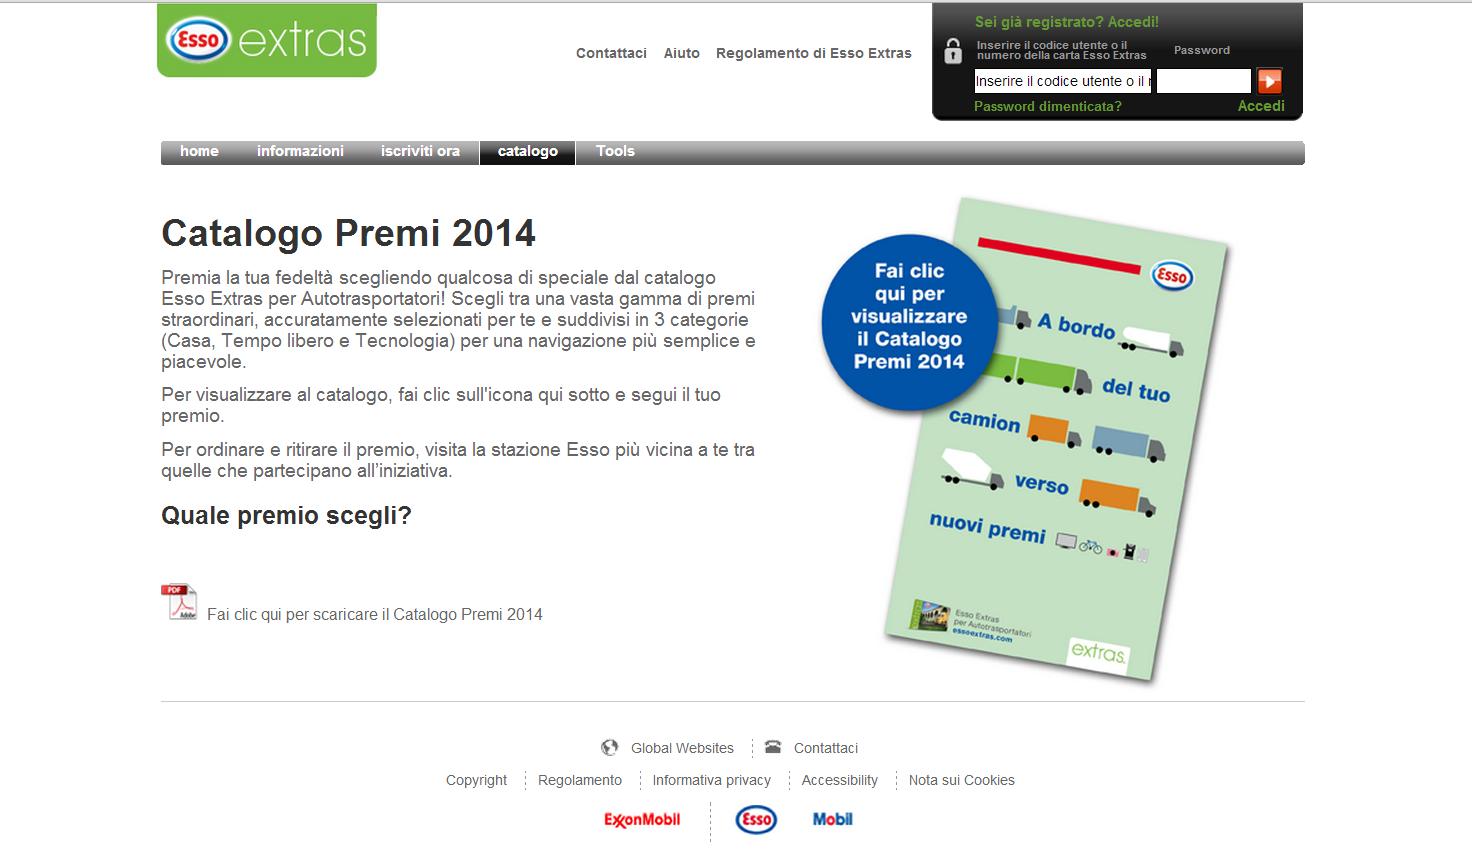 Catalogo Premi Esso Extras 2014